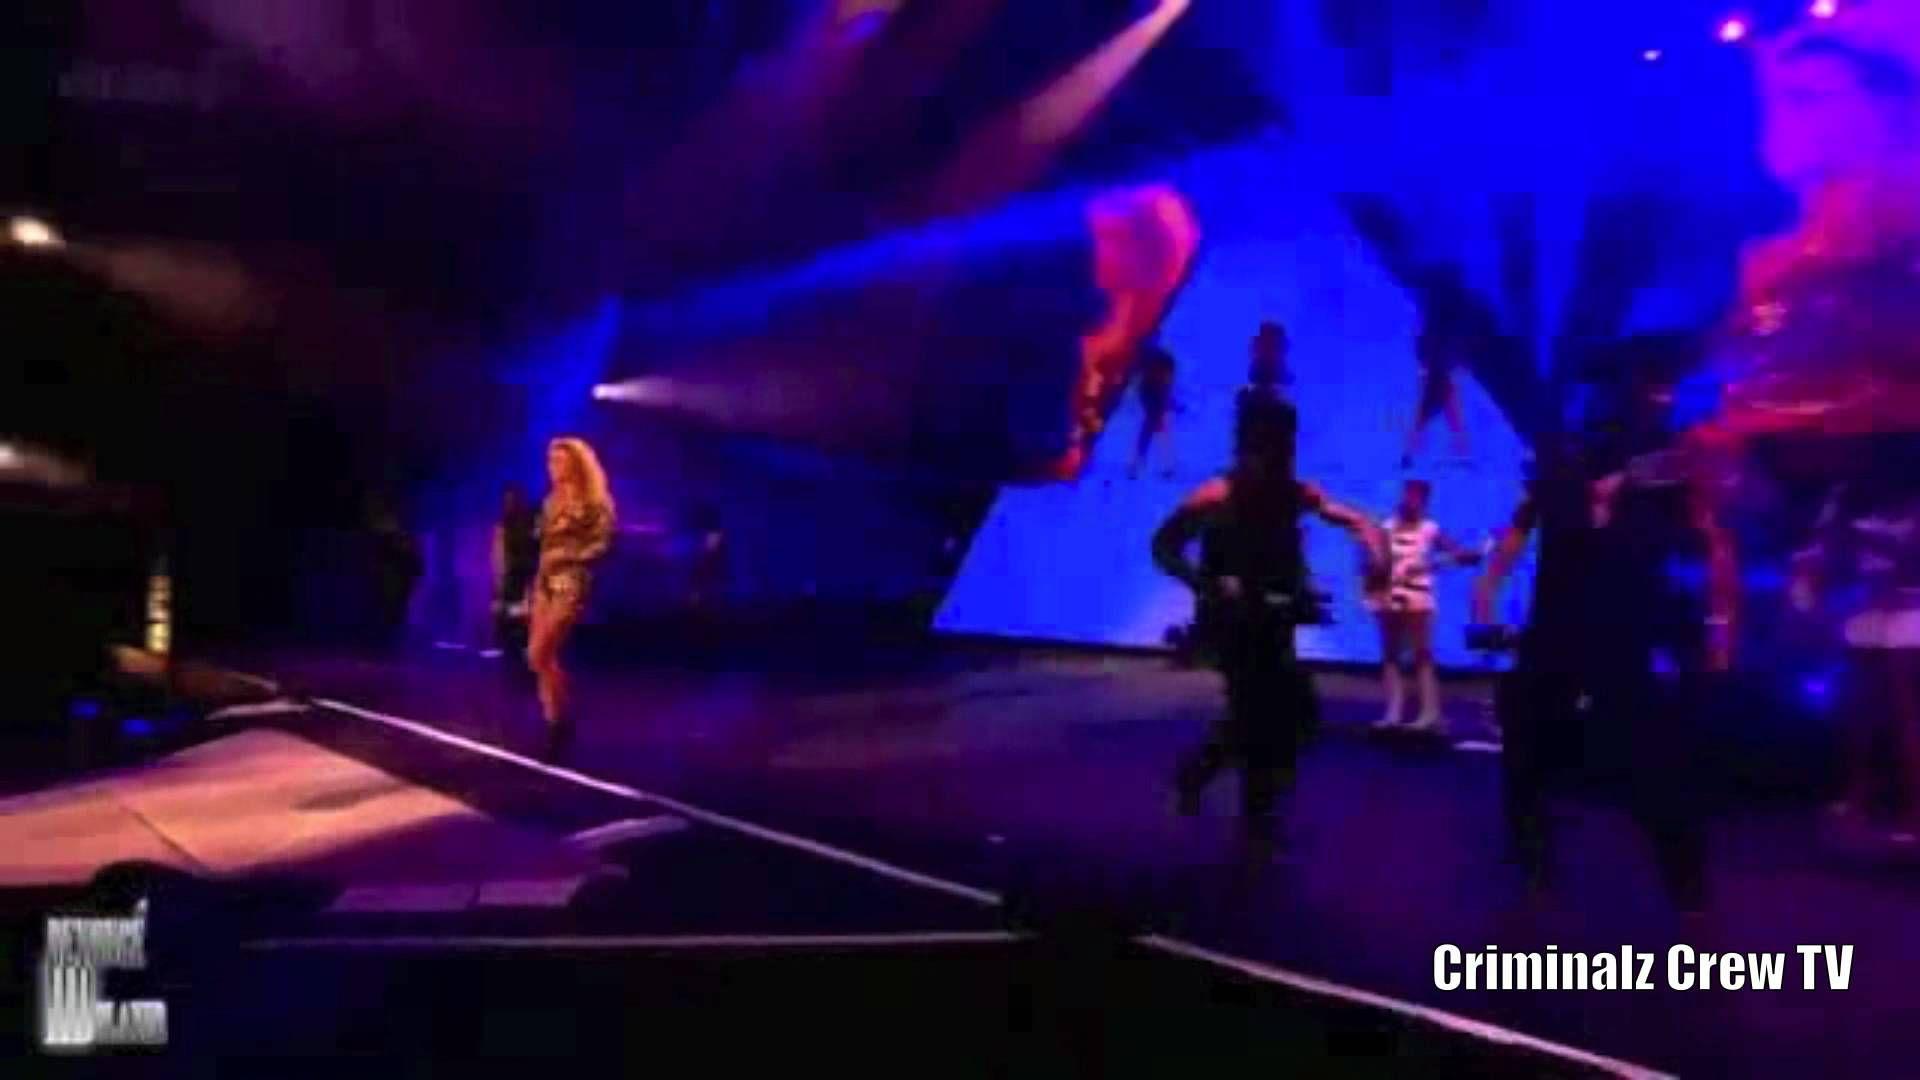 CCTV : Les Twins ( Criminalz ) performing with Beyonce